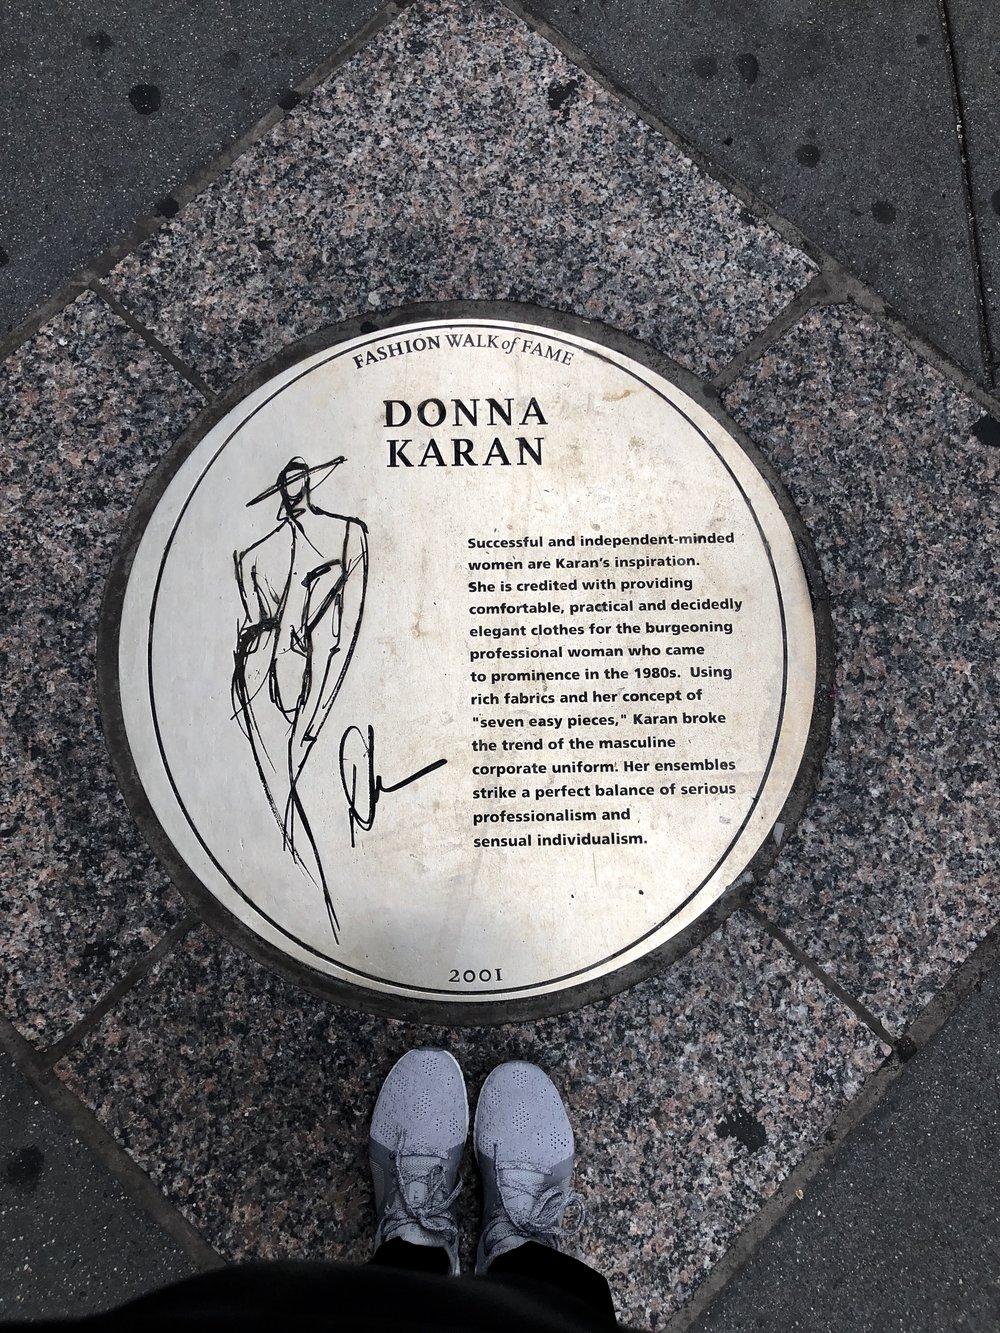 Donna Karan plaque.